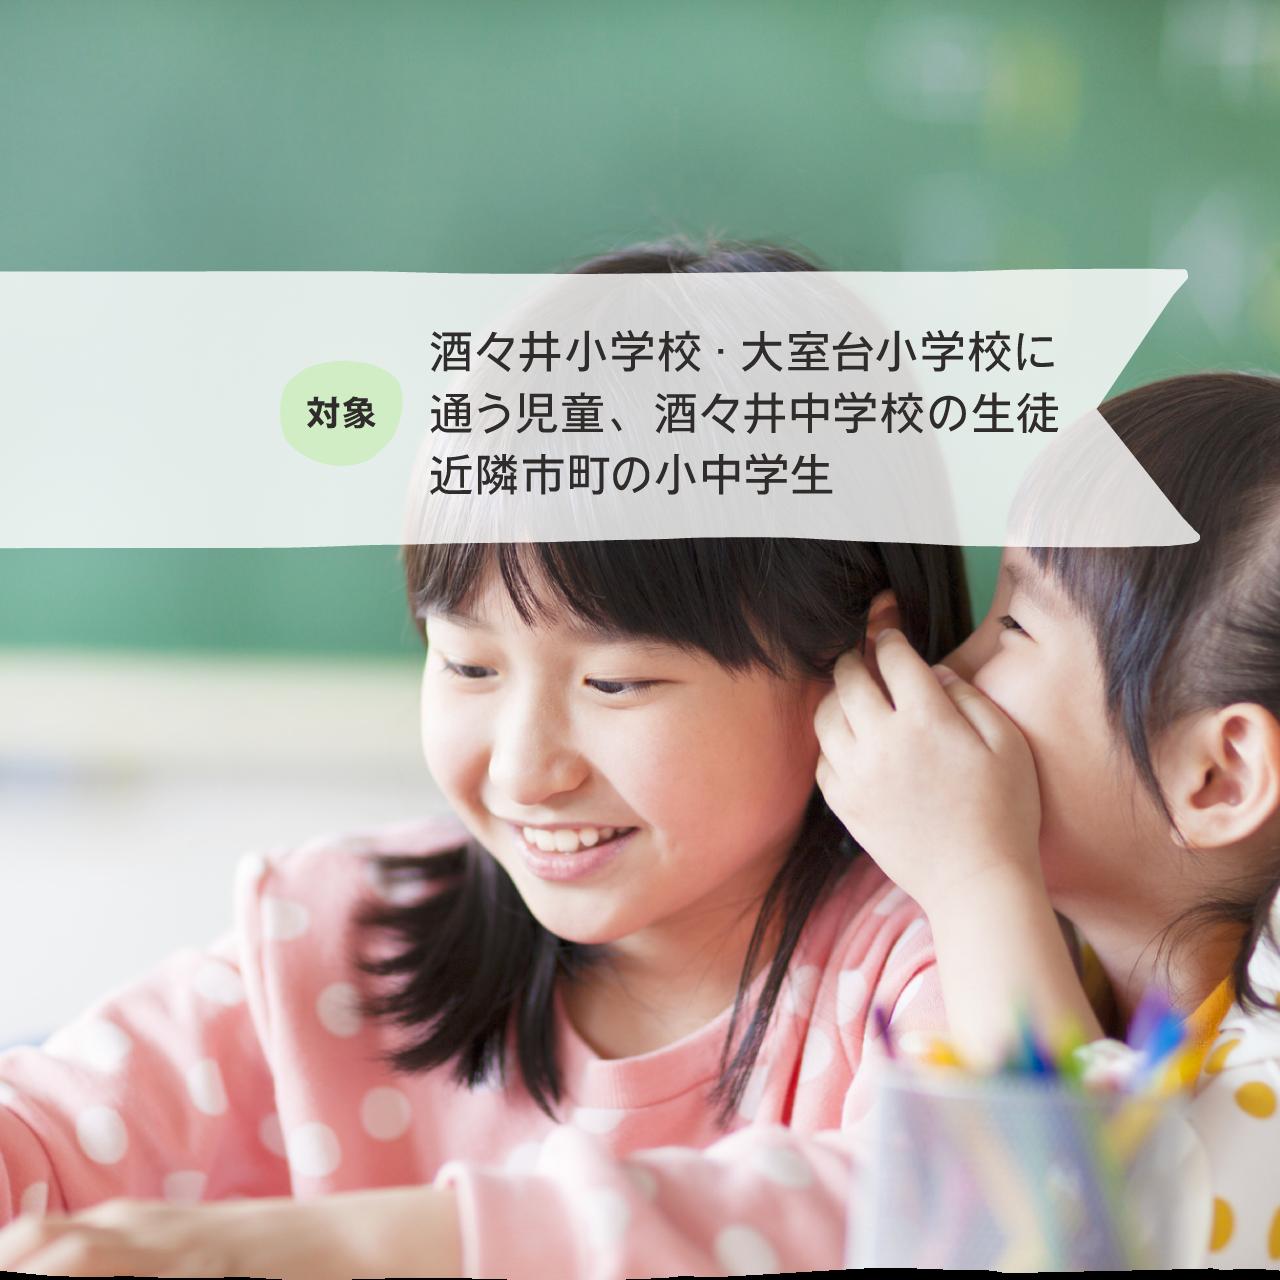 2021.06 OPEN!無料体験受付中!対象は、酒々井小学校・大室台小学校に通う児童、酒々井中学校の生徒